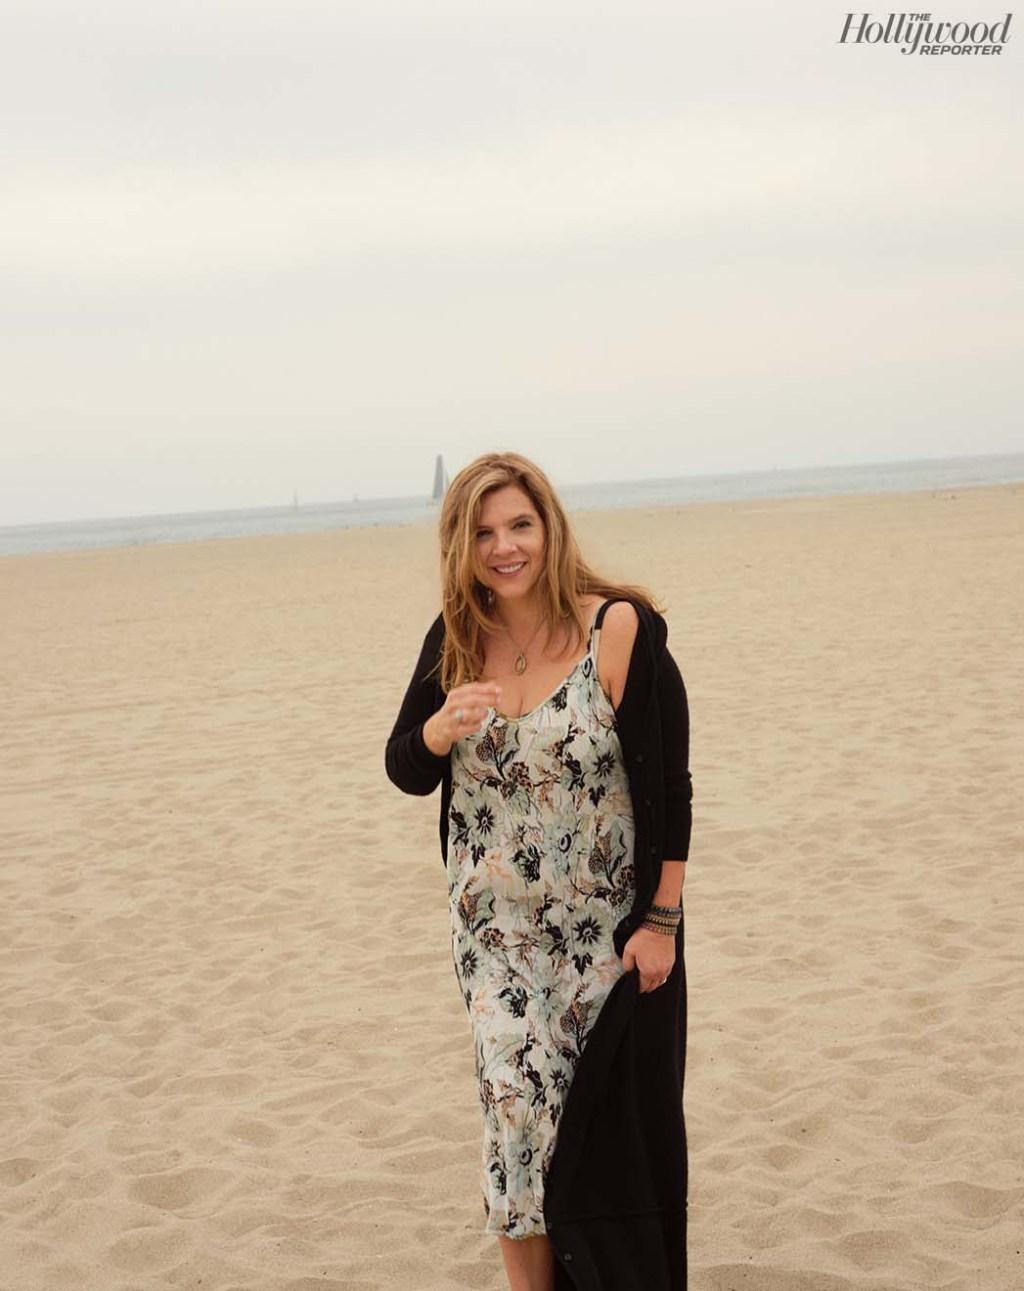 Krista Vernoff Photographed By Brad Torchia